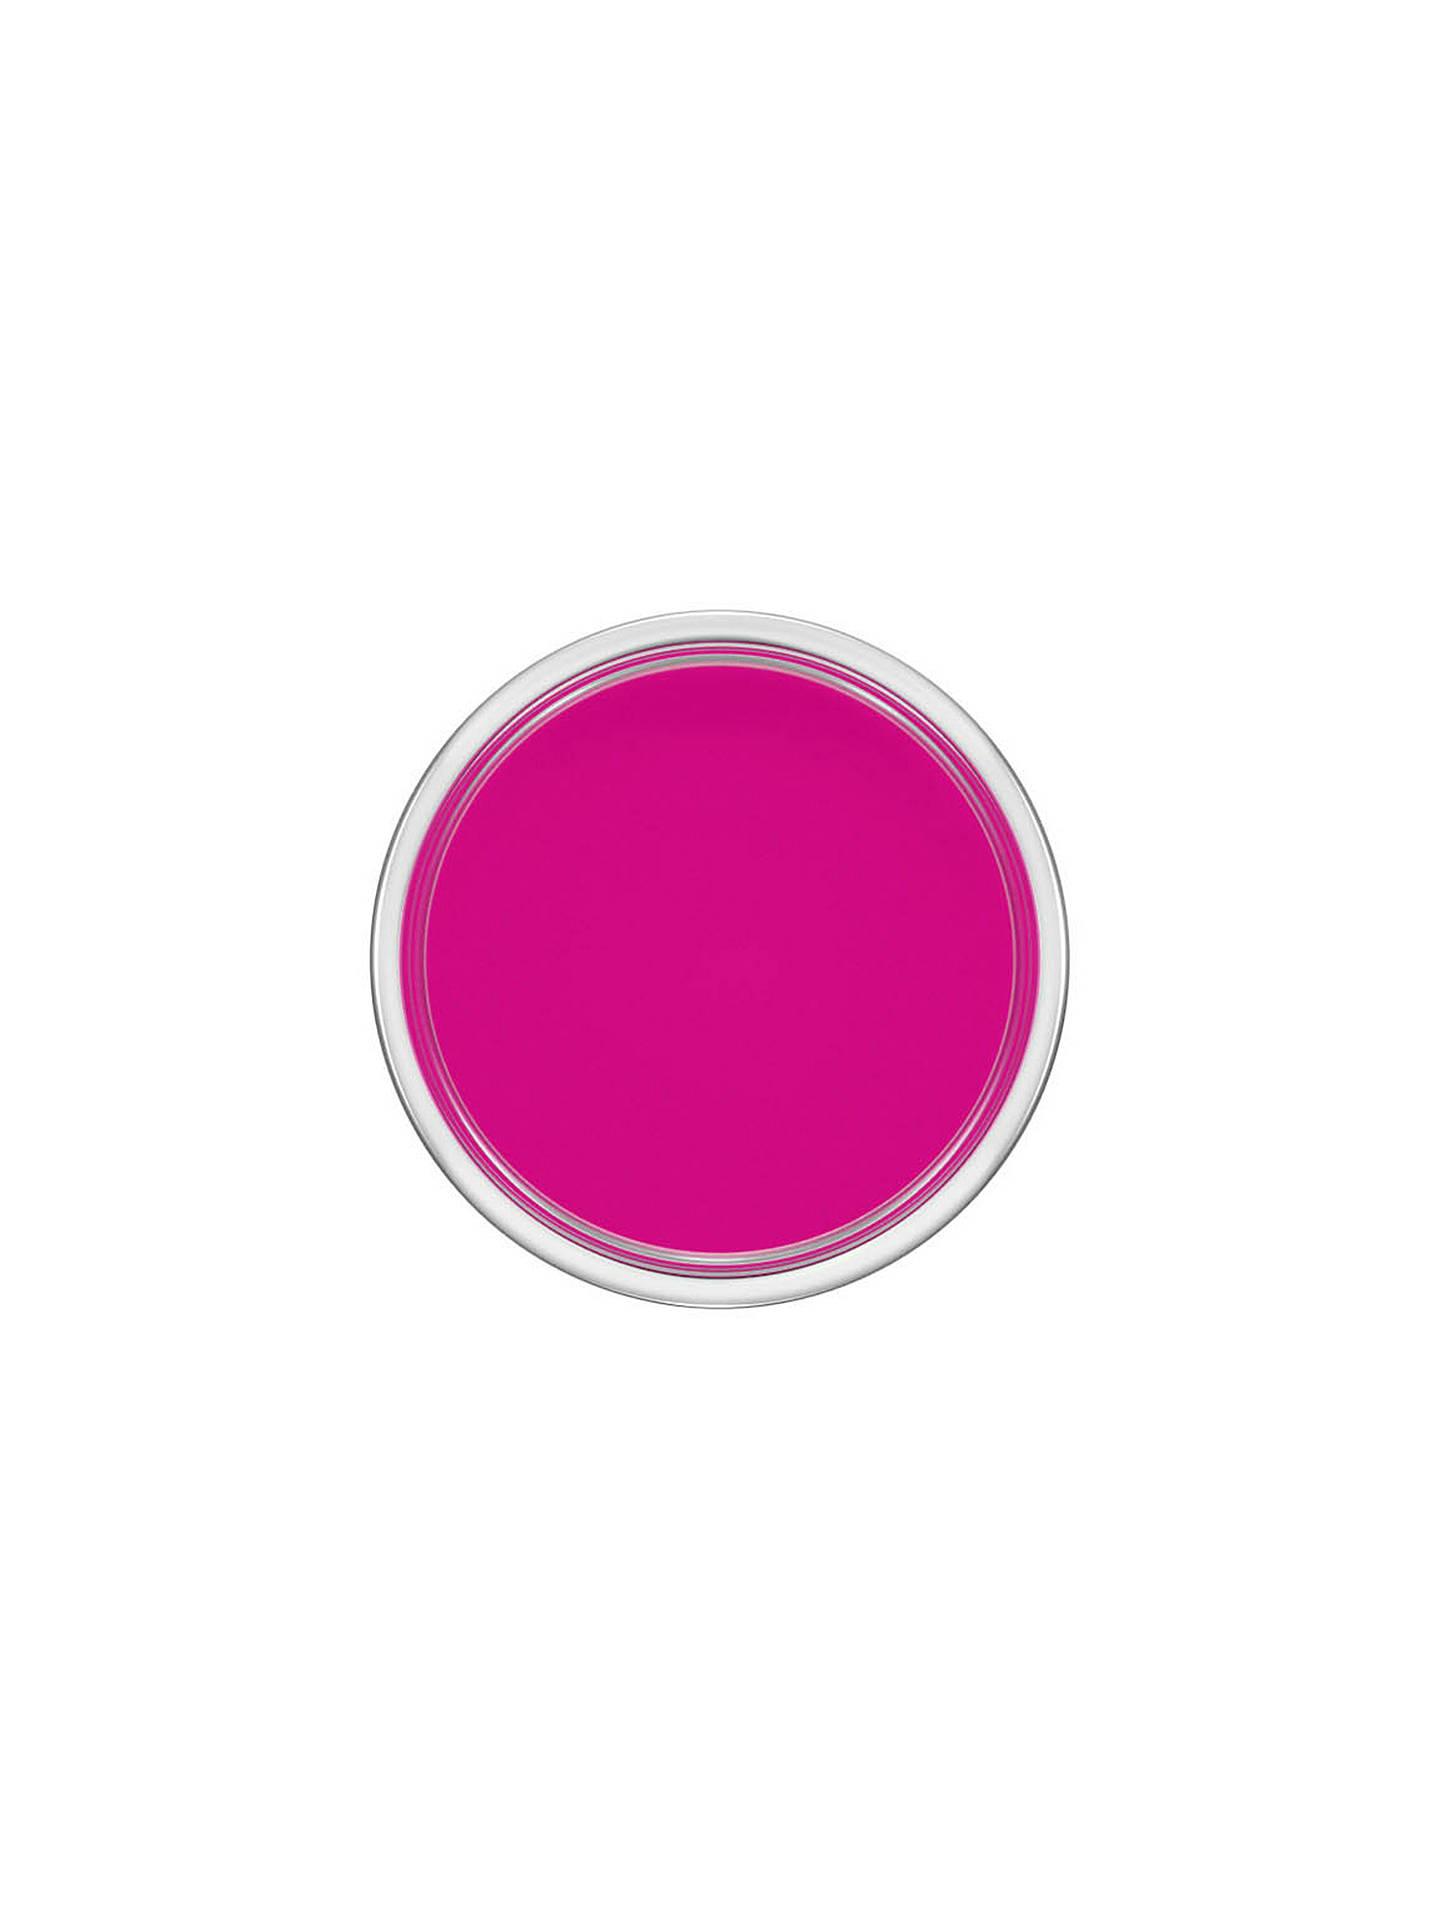 Elle 18 lipstick shades card